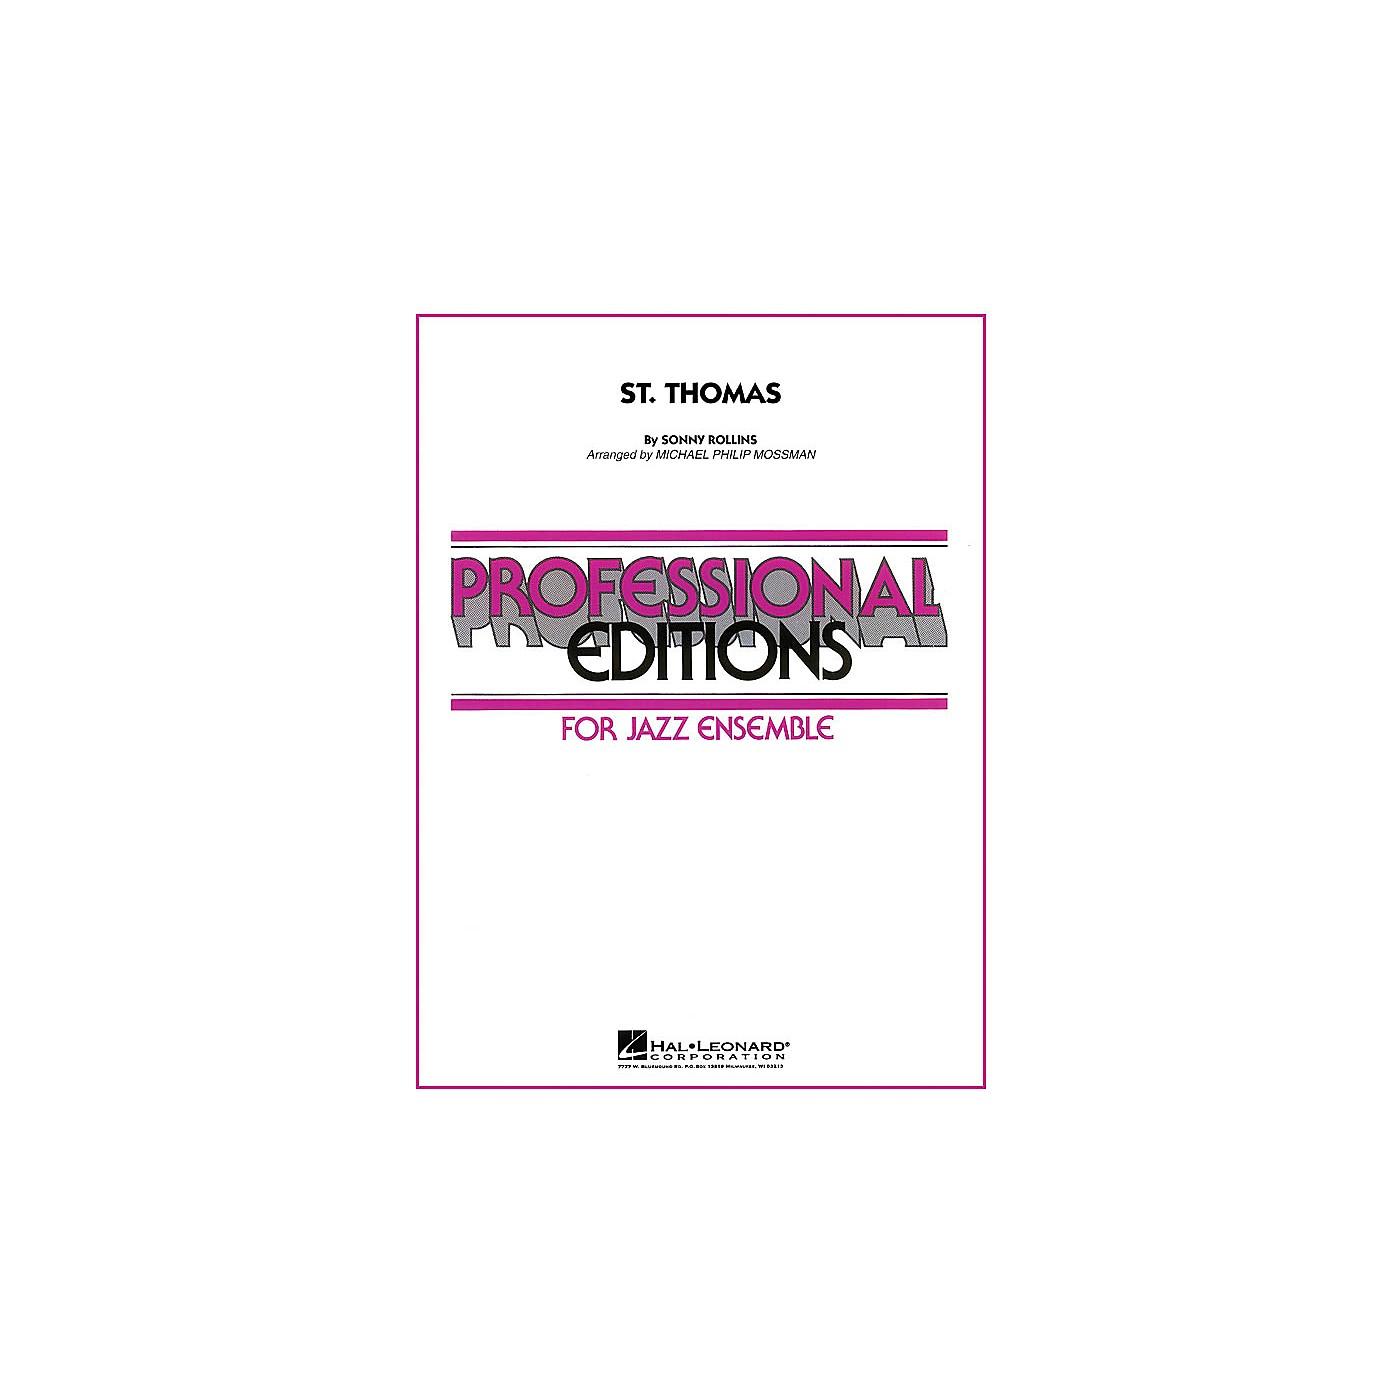 Hal Leonard St. Thomas Jazz Band Level 5 Arranged by Michael Philip Mossman thumbnail